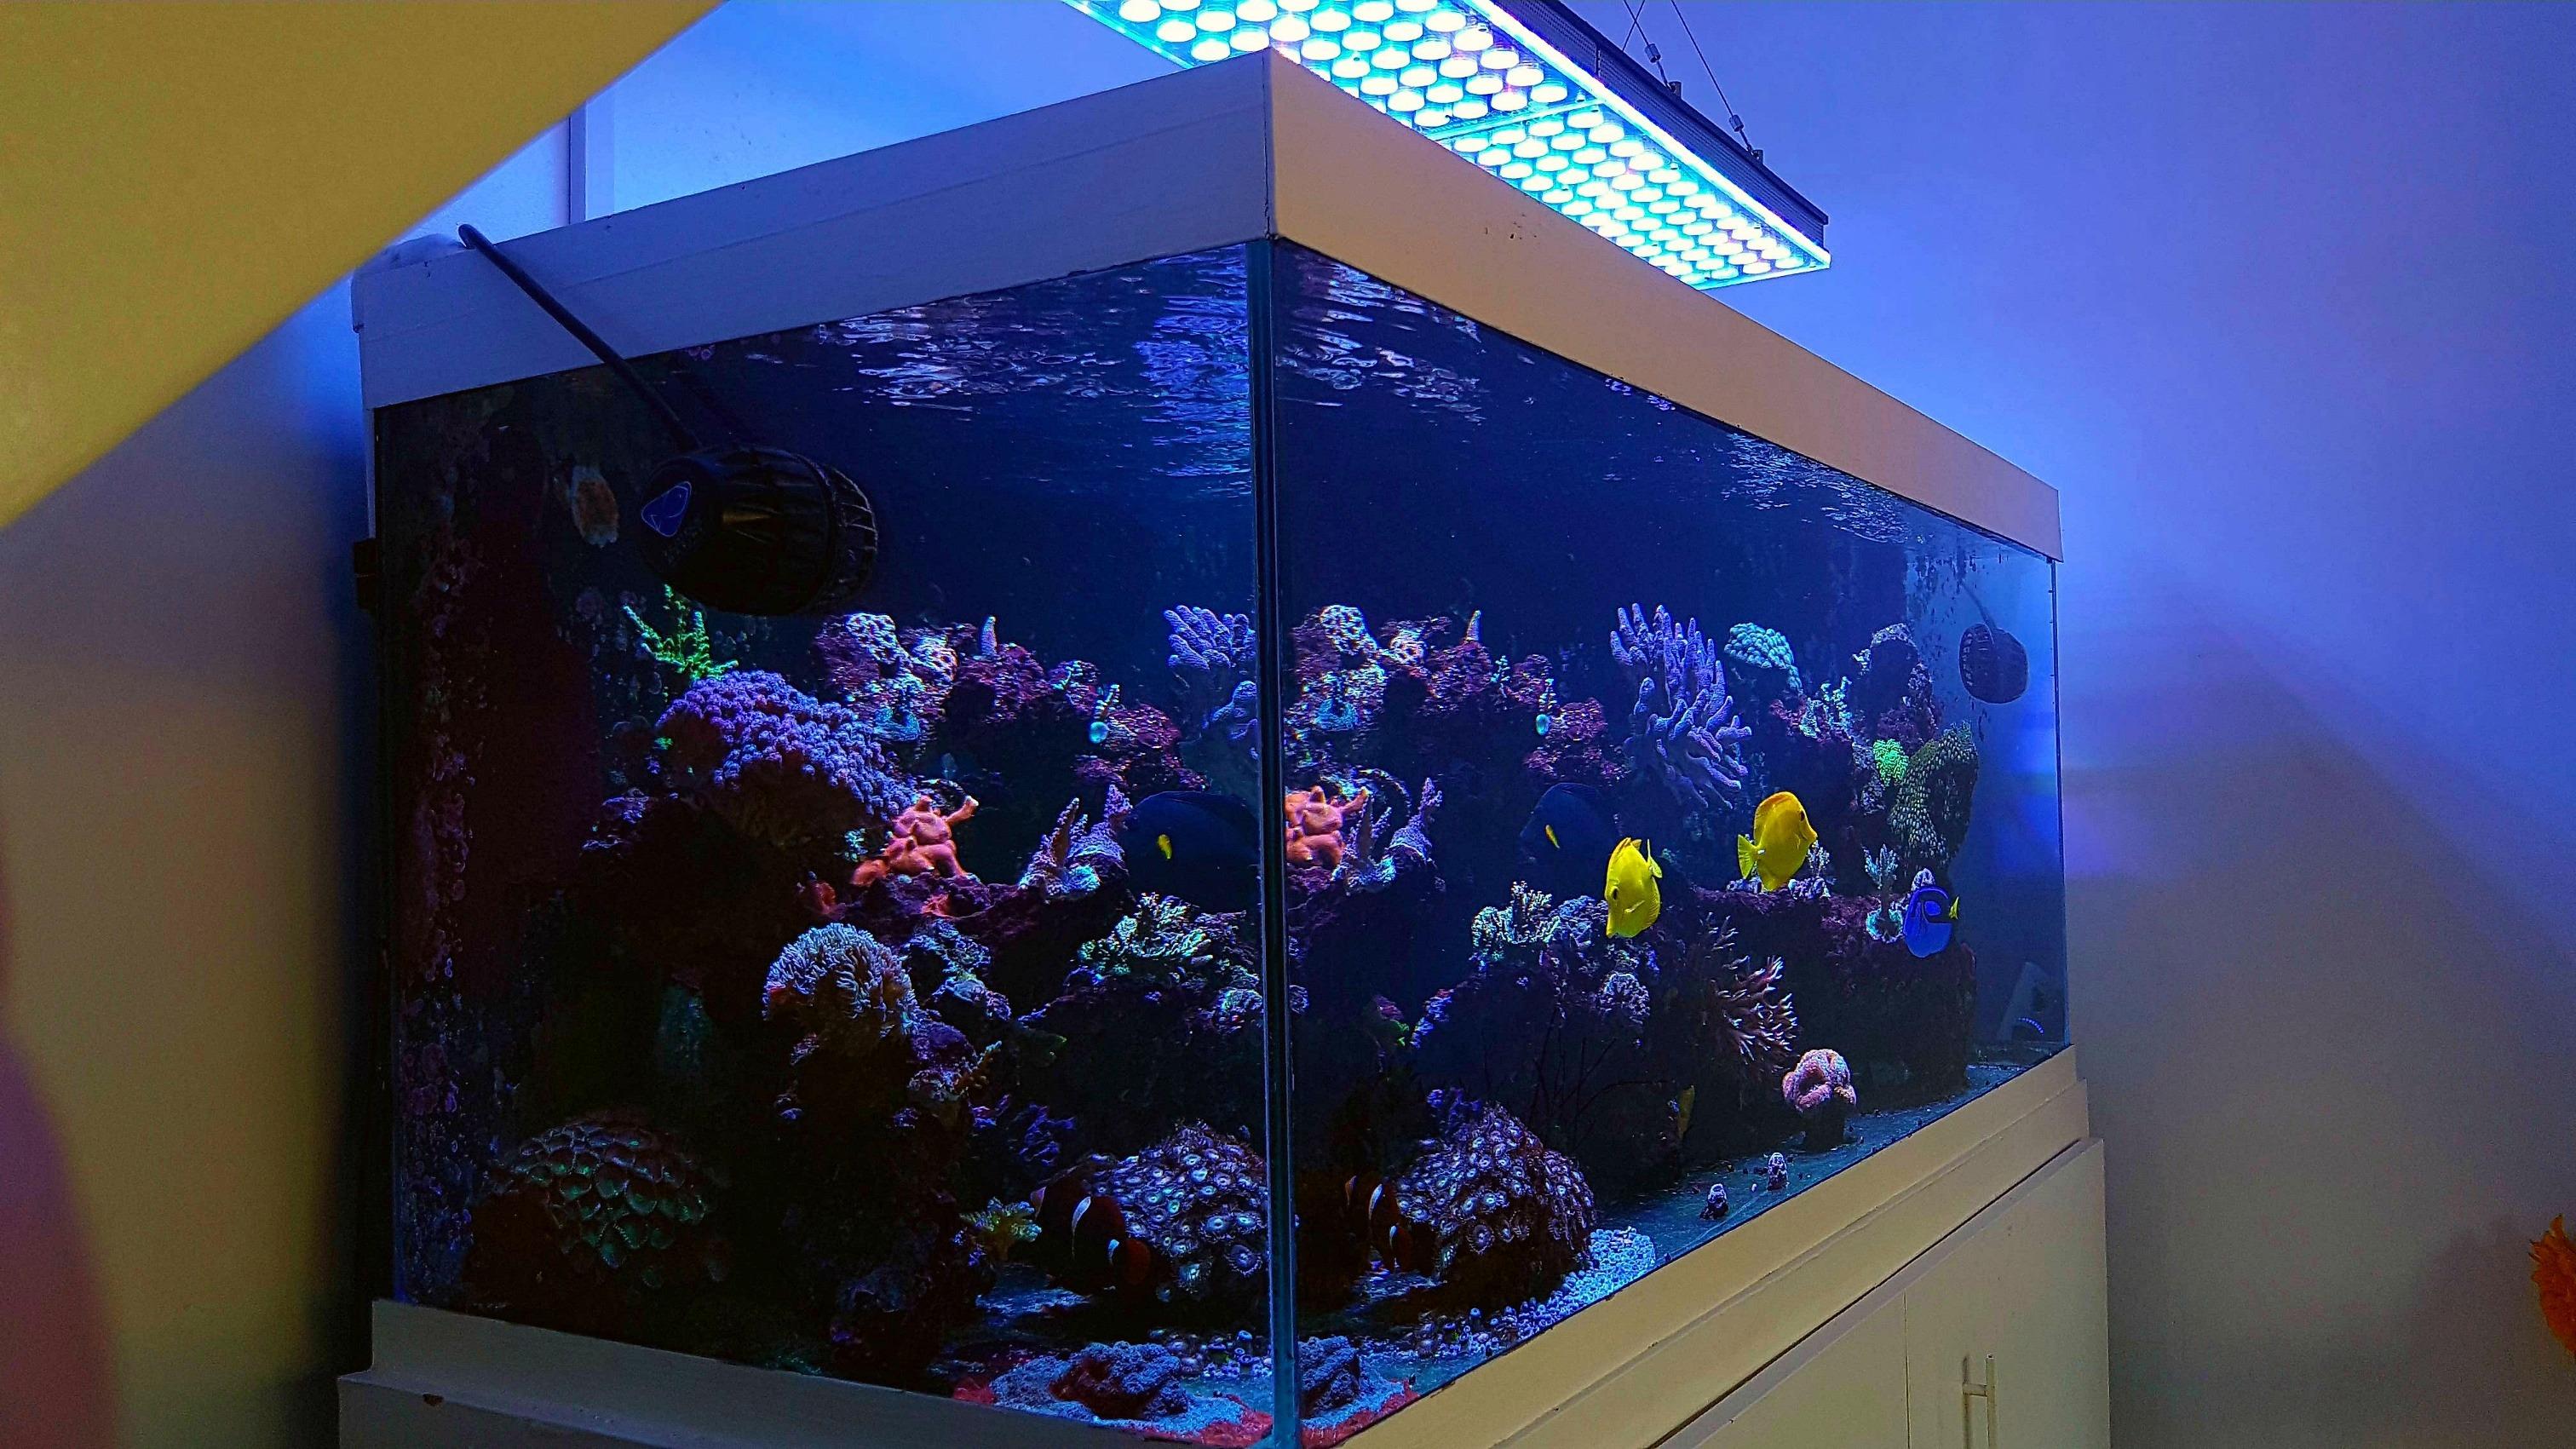 https://orphek.com/led/wp-content/uploads/2017/12/best-Aquarium-led-light-orphek.jpg